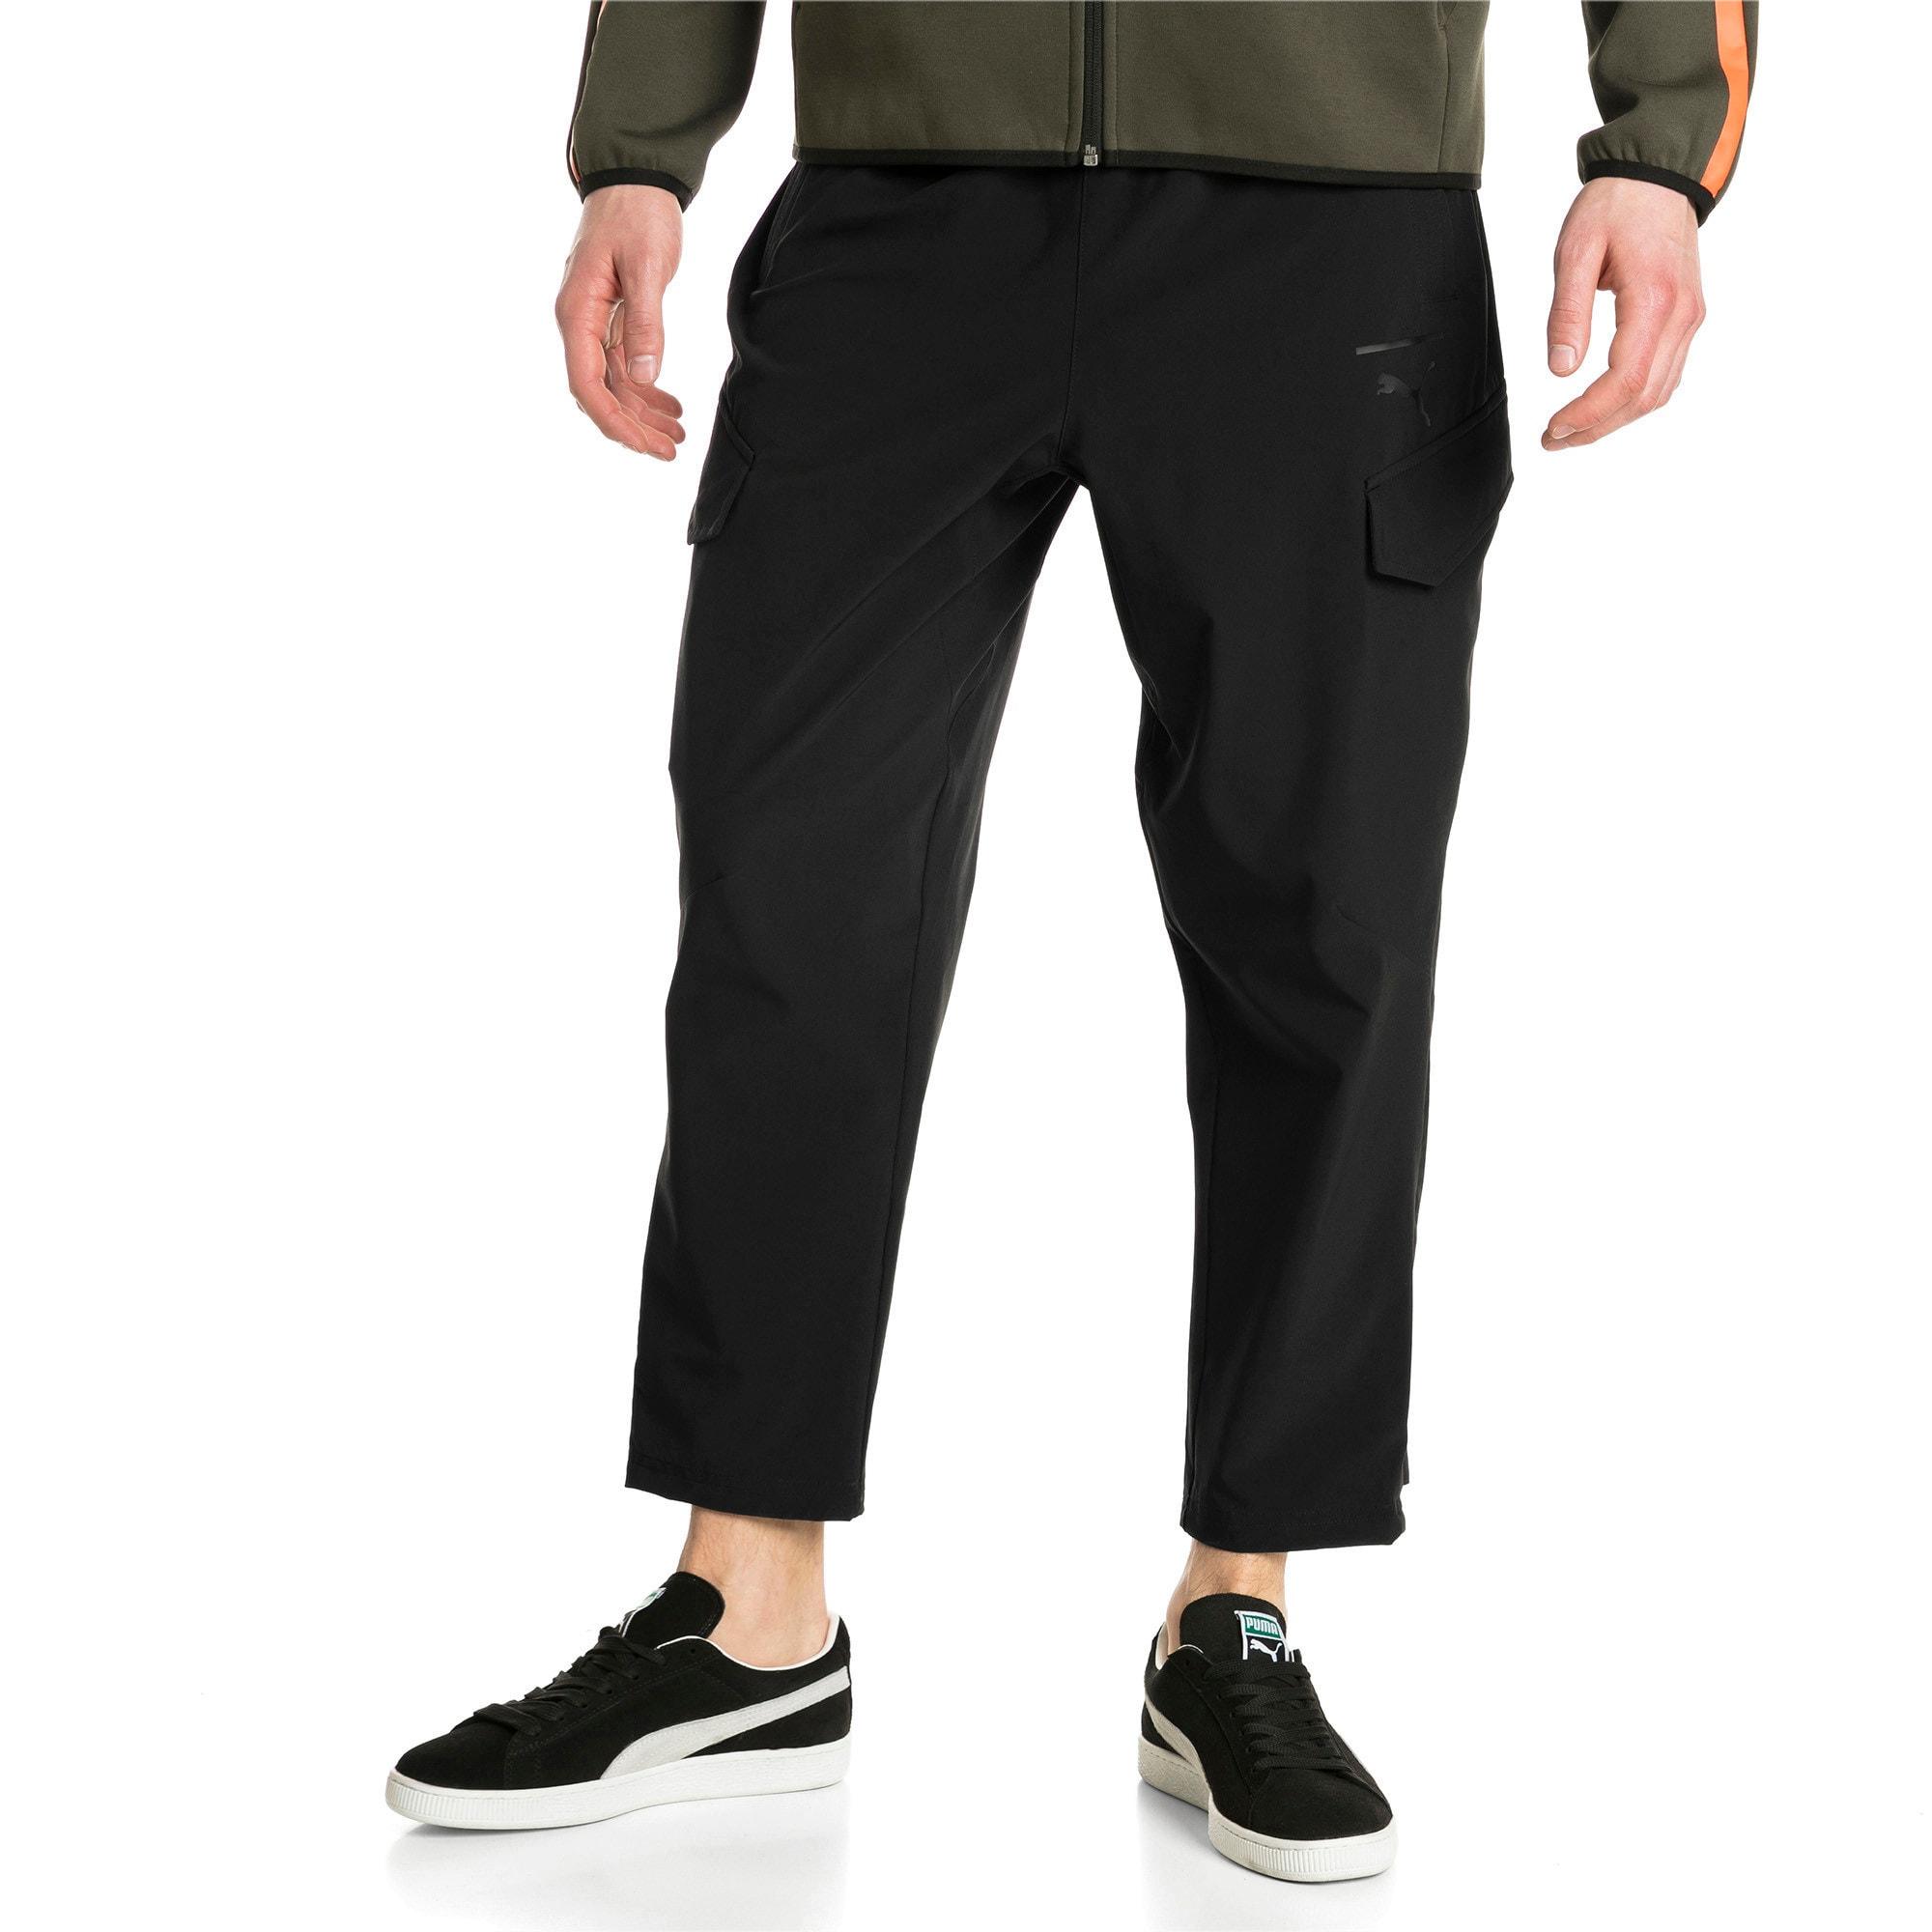 Thumbnail 1 of Pace Men's Sweatpants, Puma Black-1, medium-IND